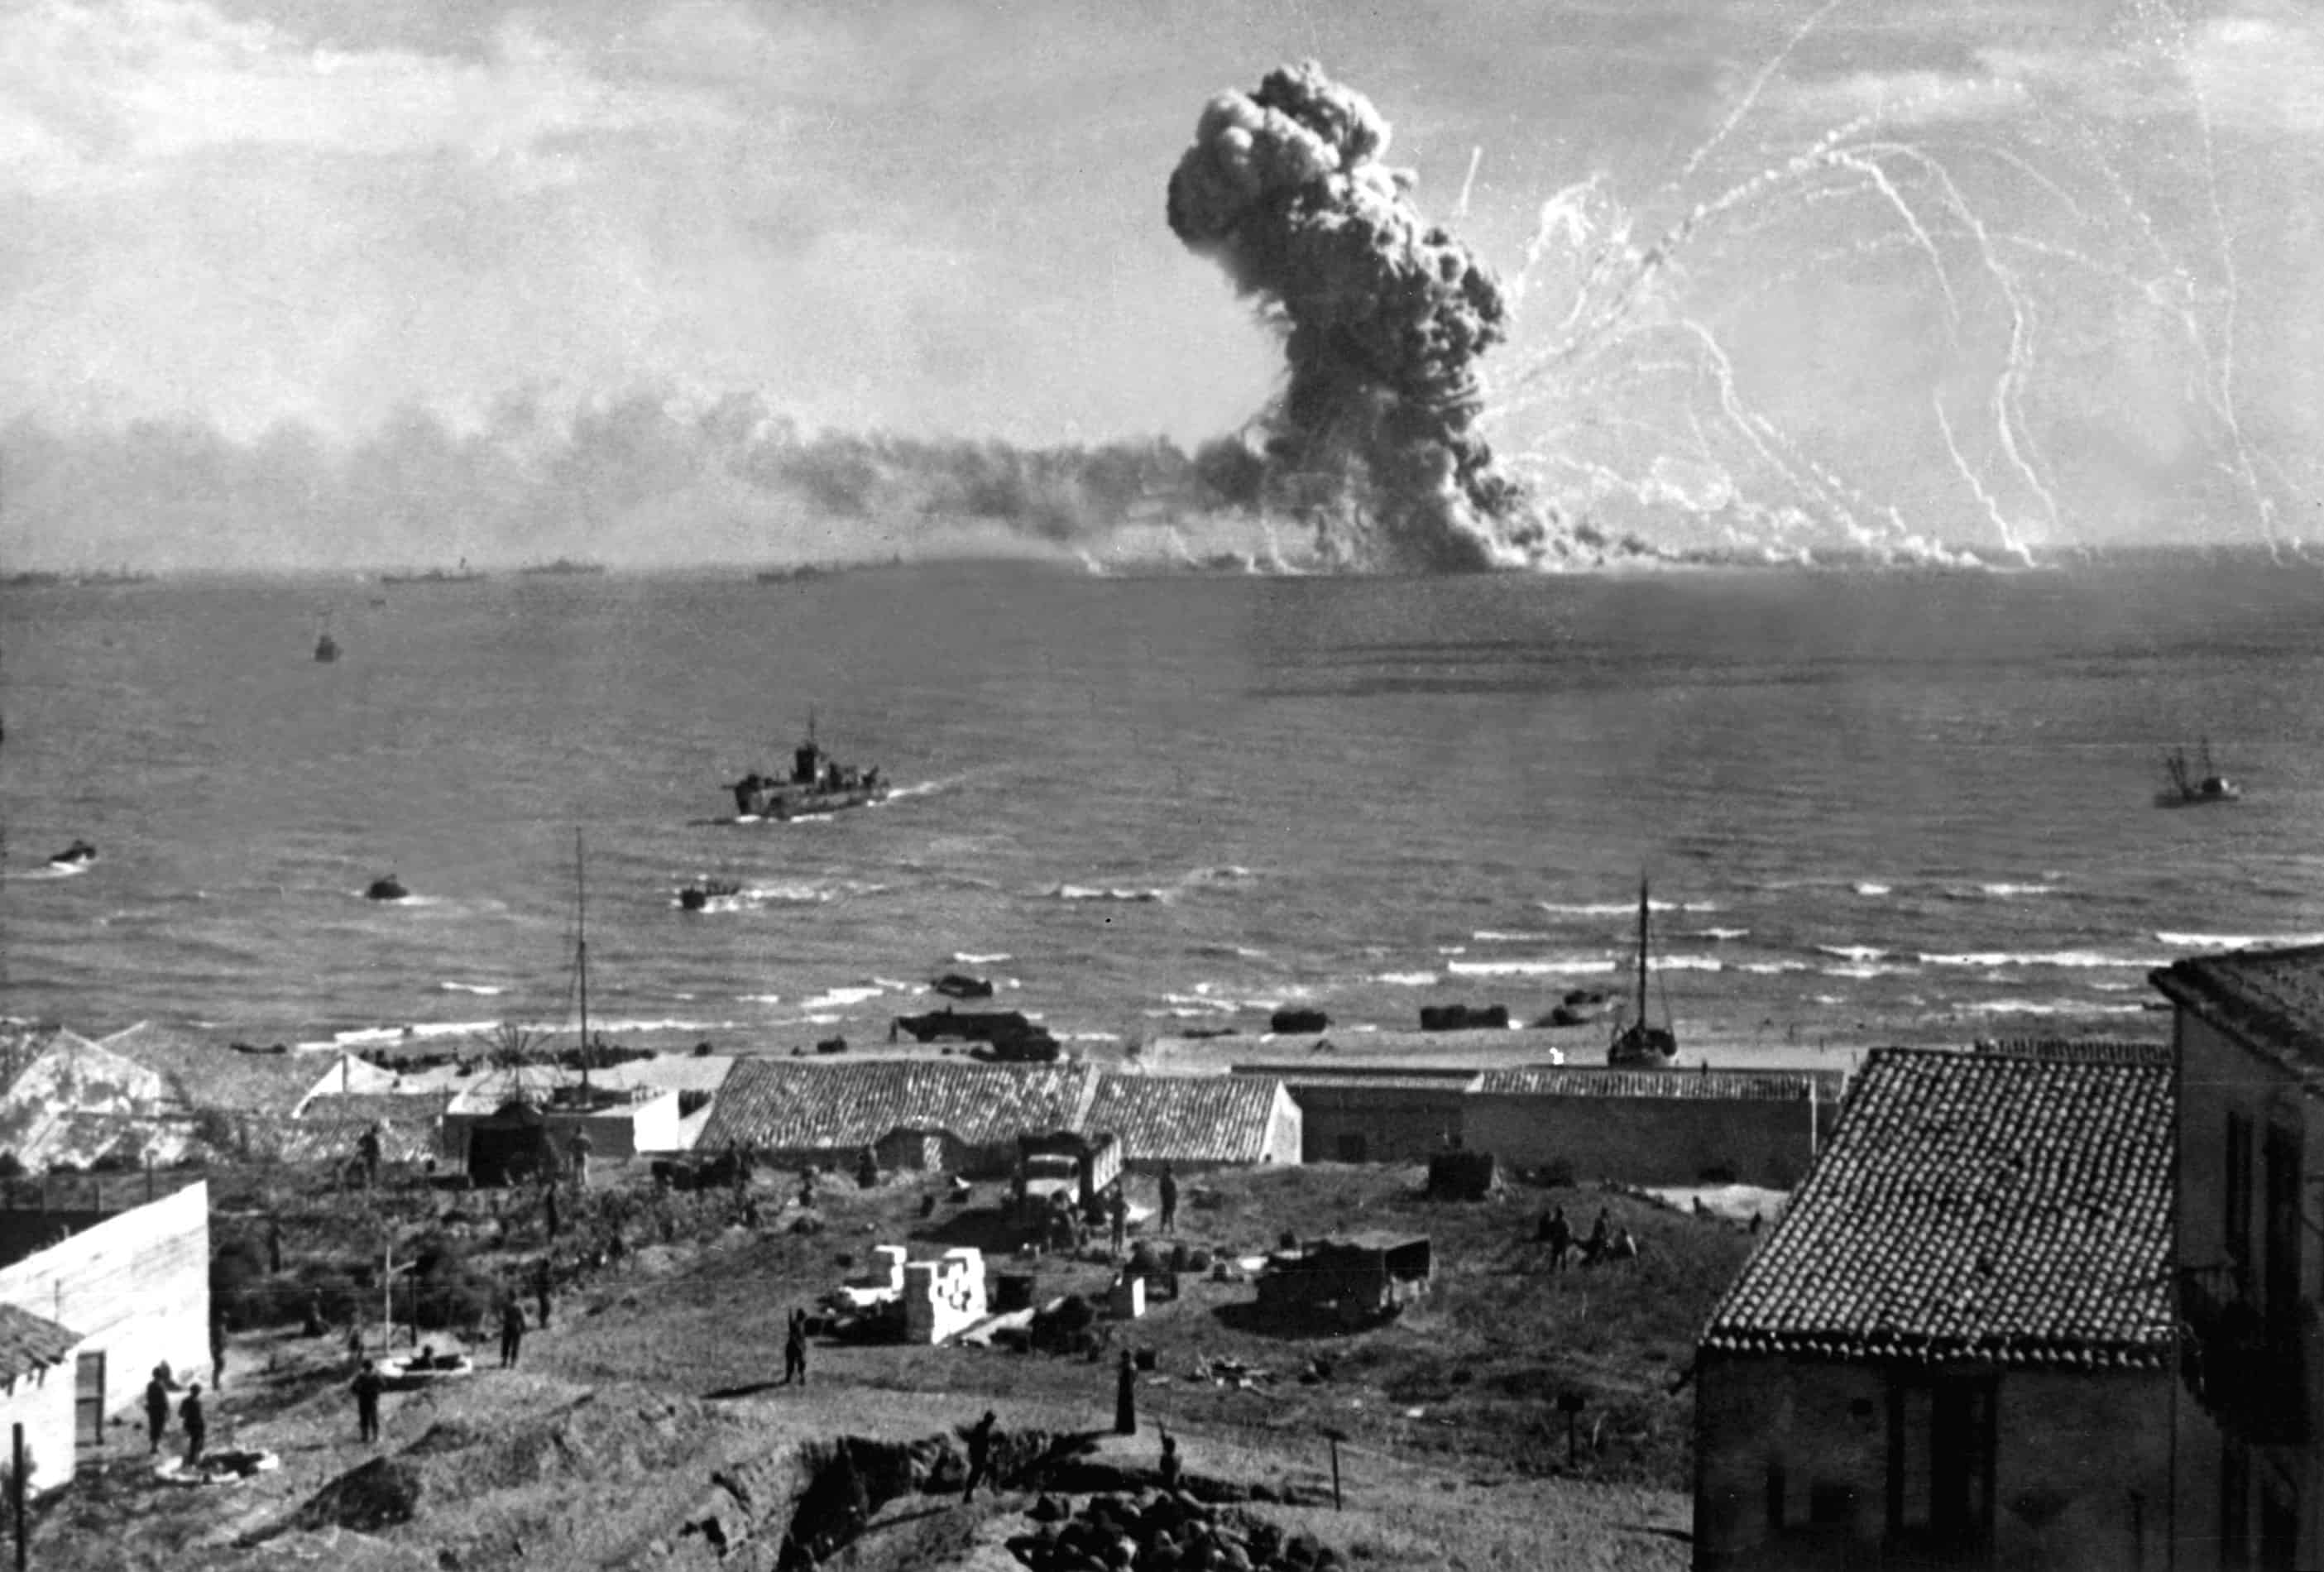 1943; German plane bombs American cargo ship